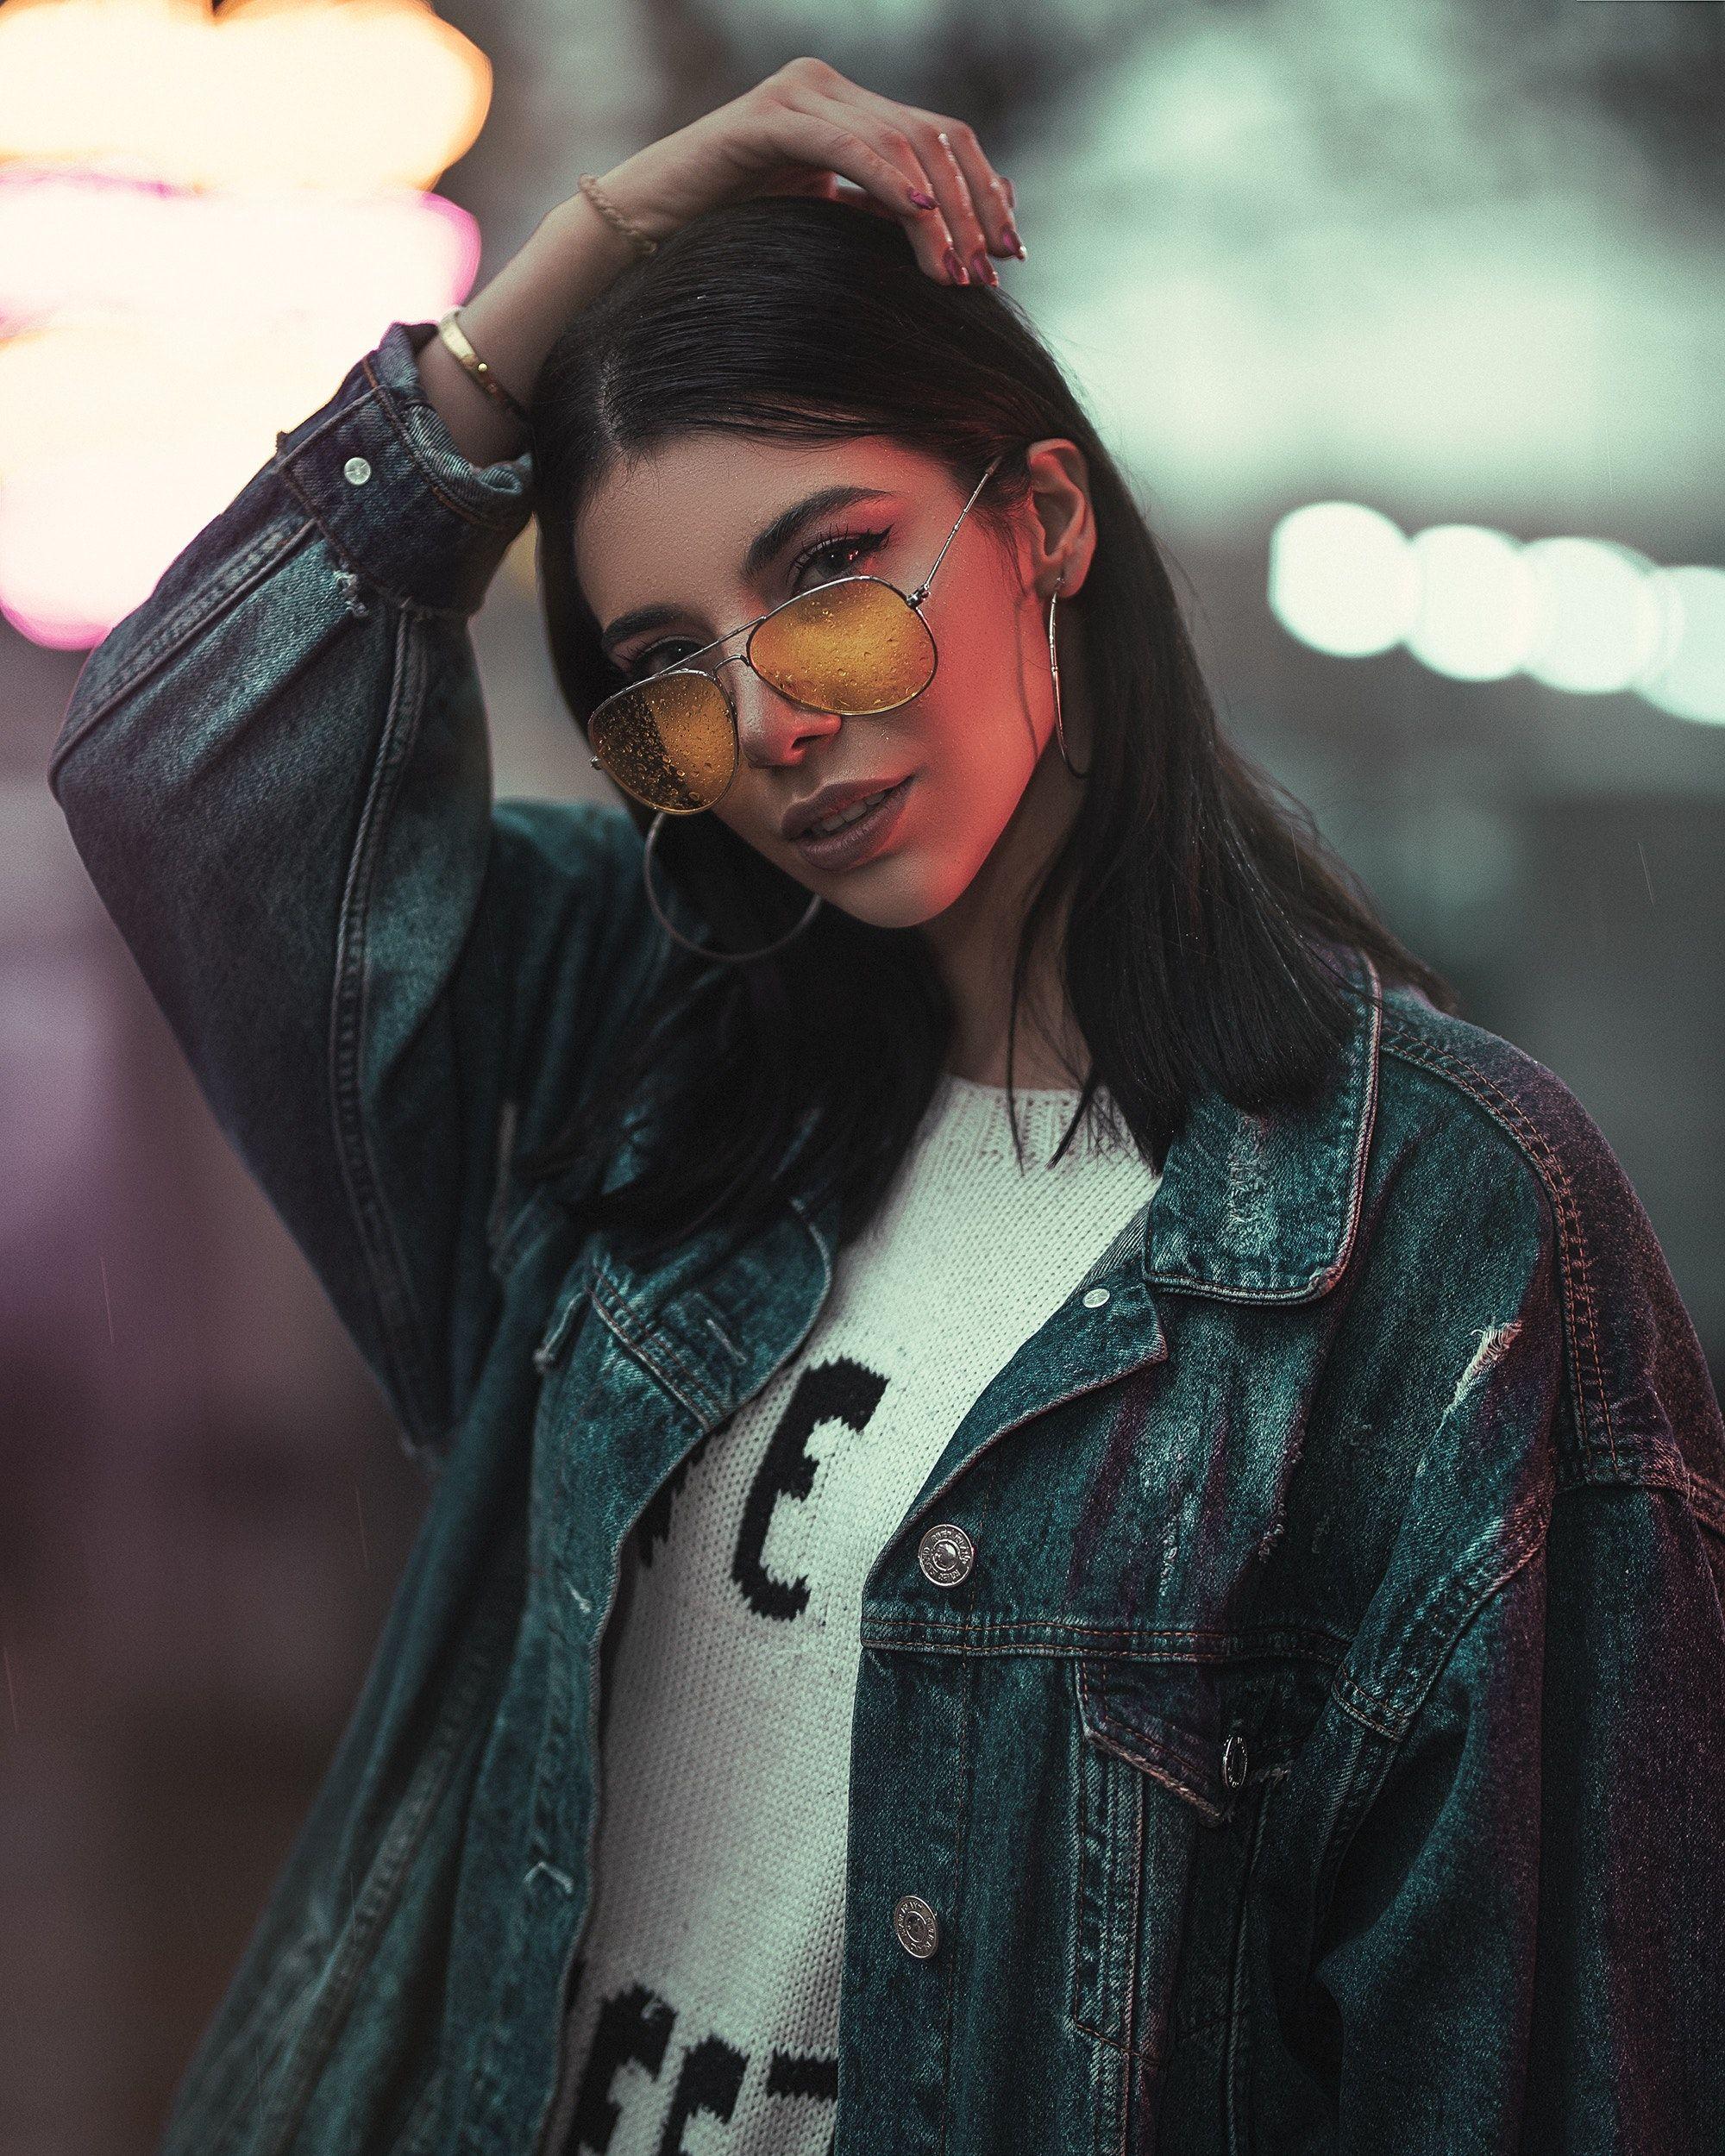 Wholesale Denim Jackets Manufacturer Usa Canada Australia Uae Fashion Wholesale Denim Model [ 2500 x 2000 Pixel ]